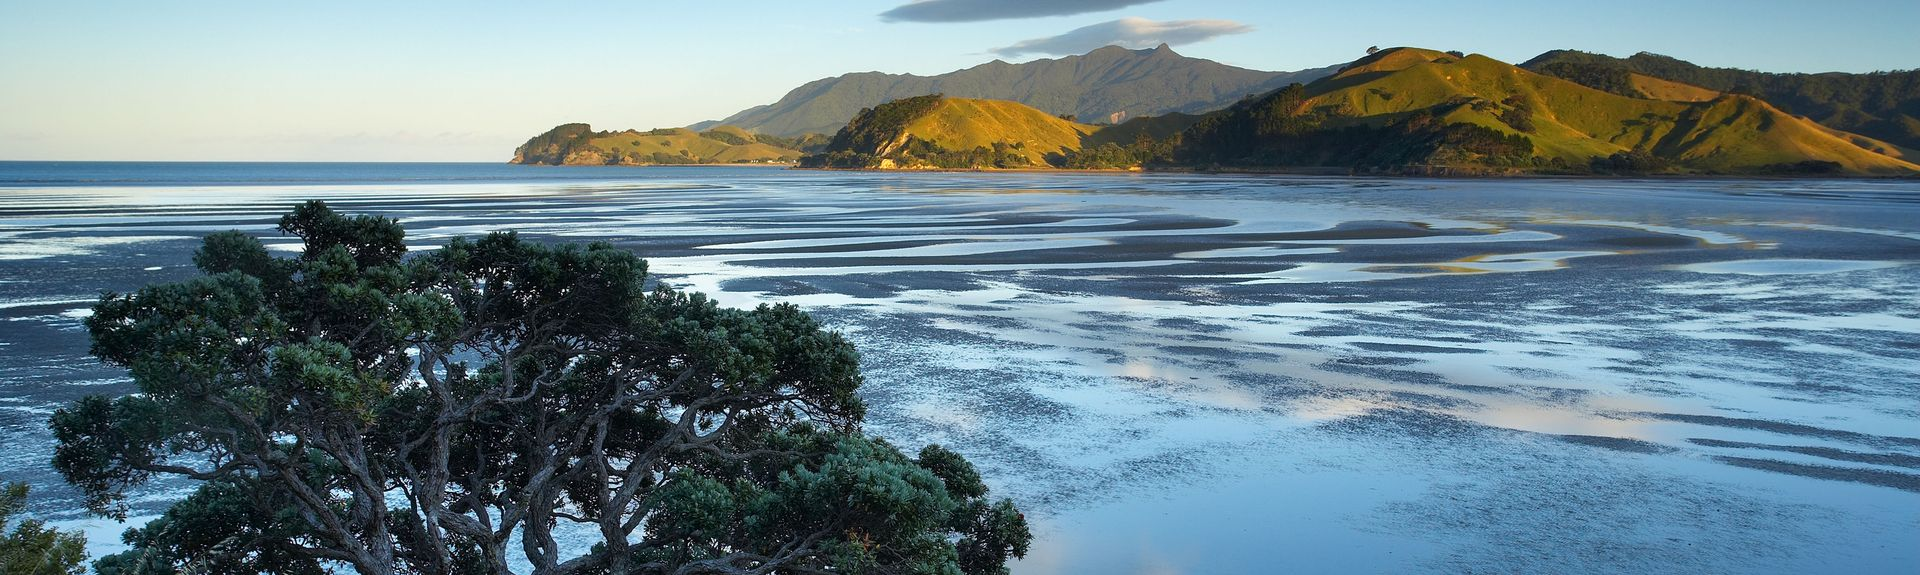 Colville, Thames-Coromandel, Waikato, New Zealand